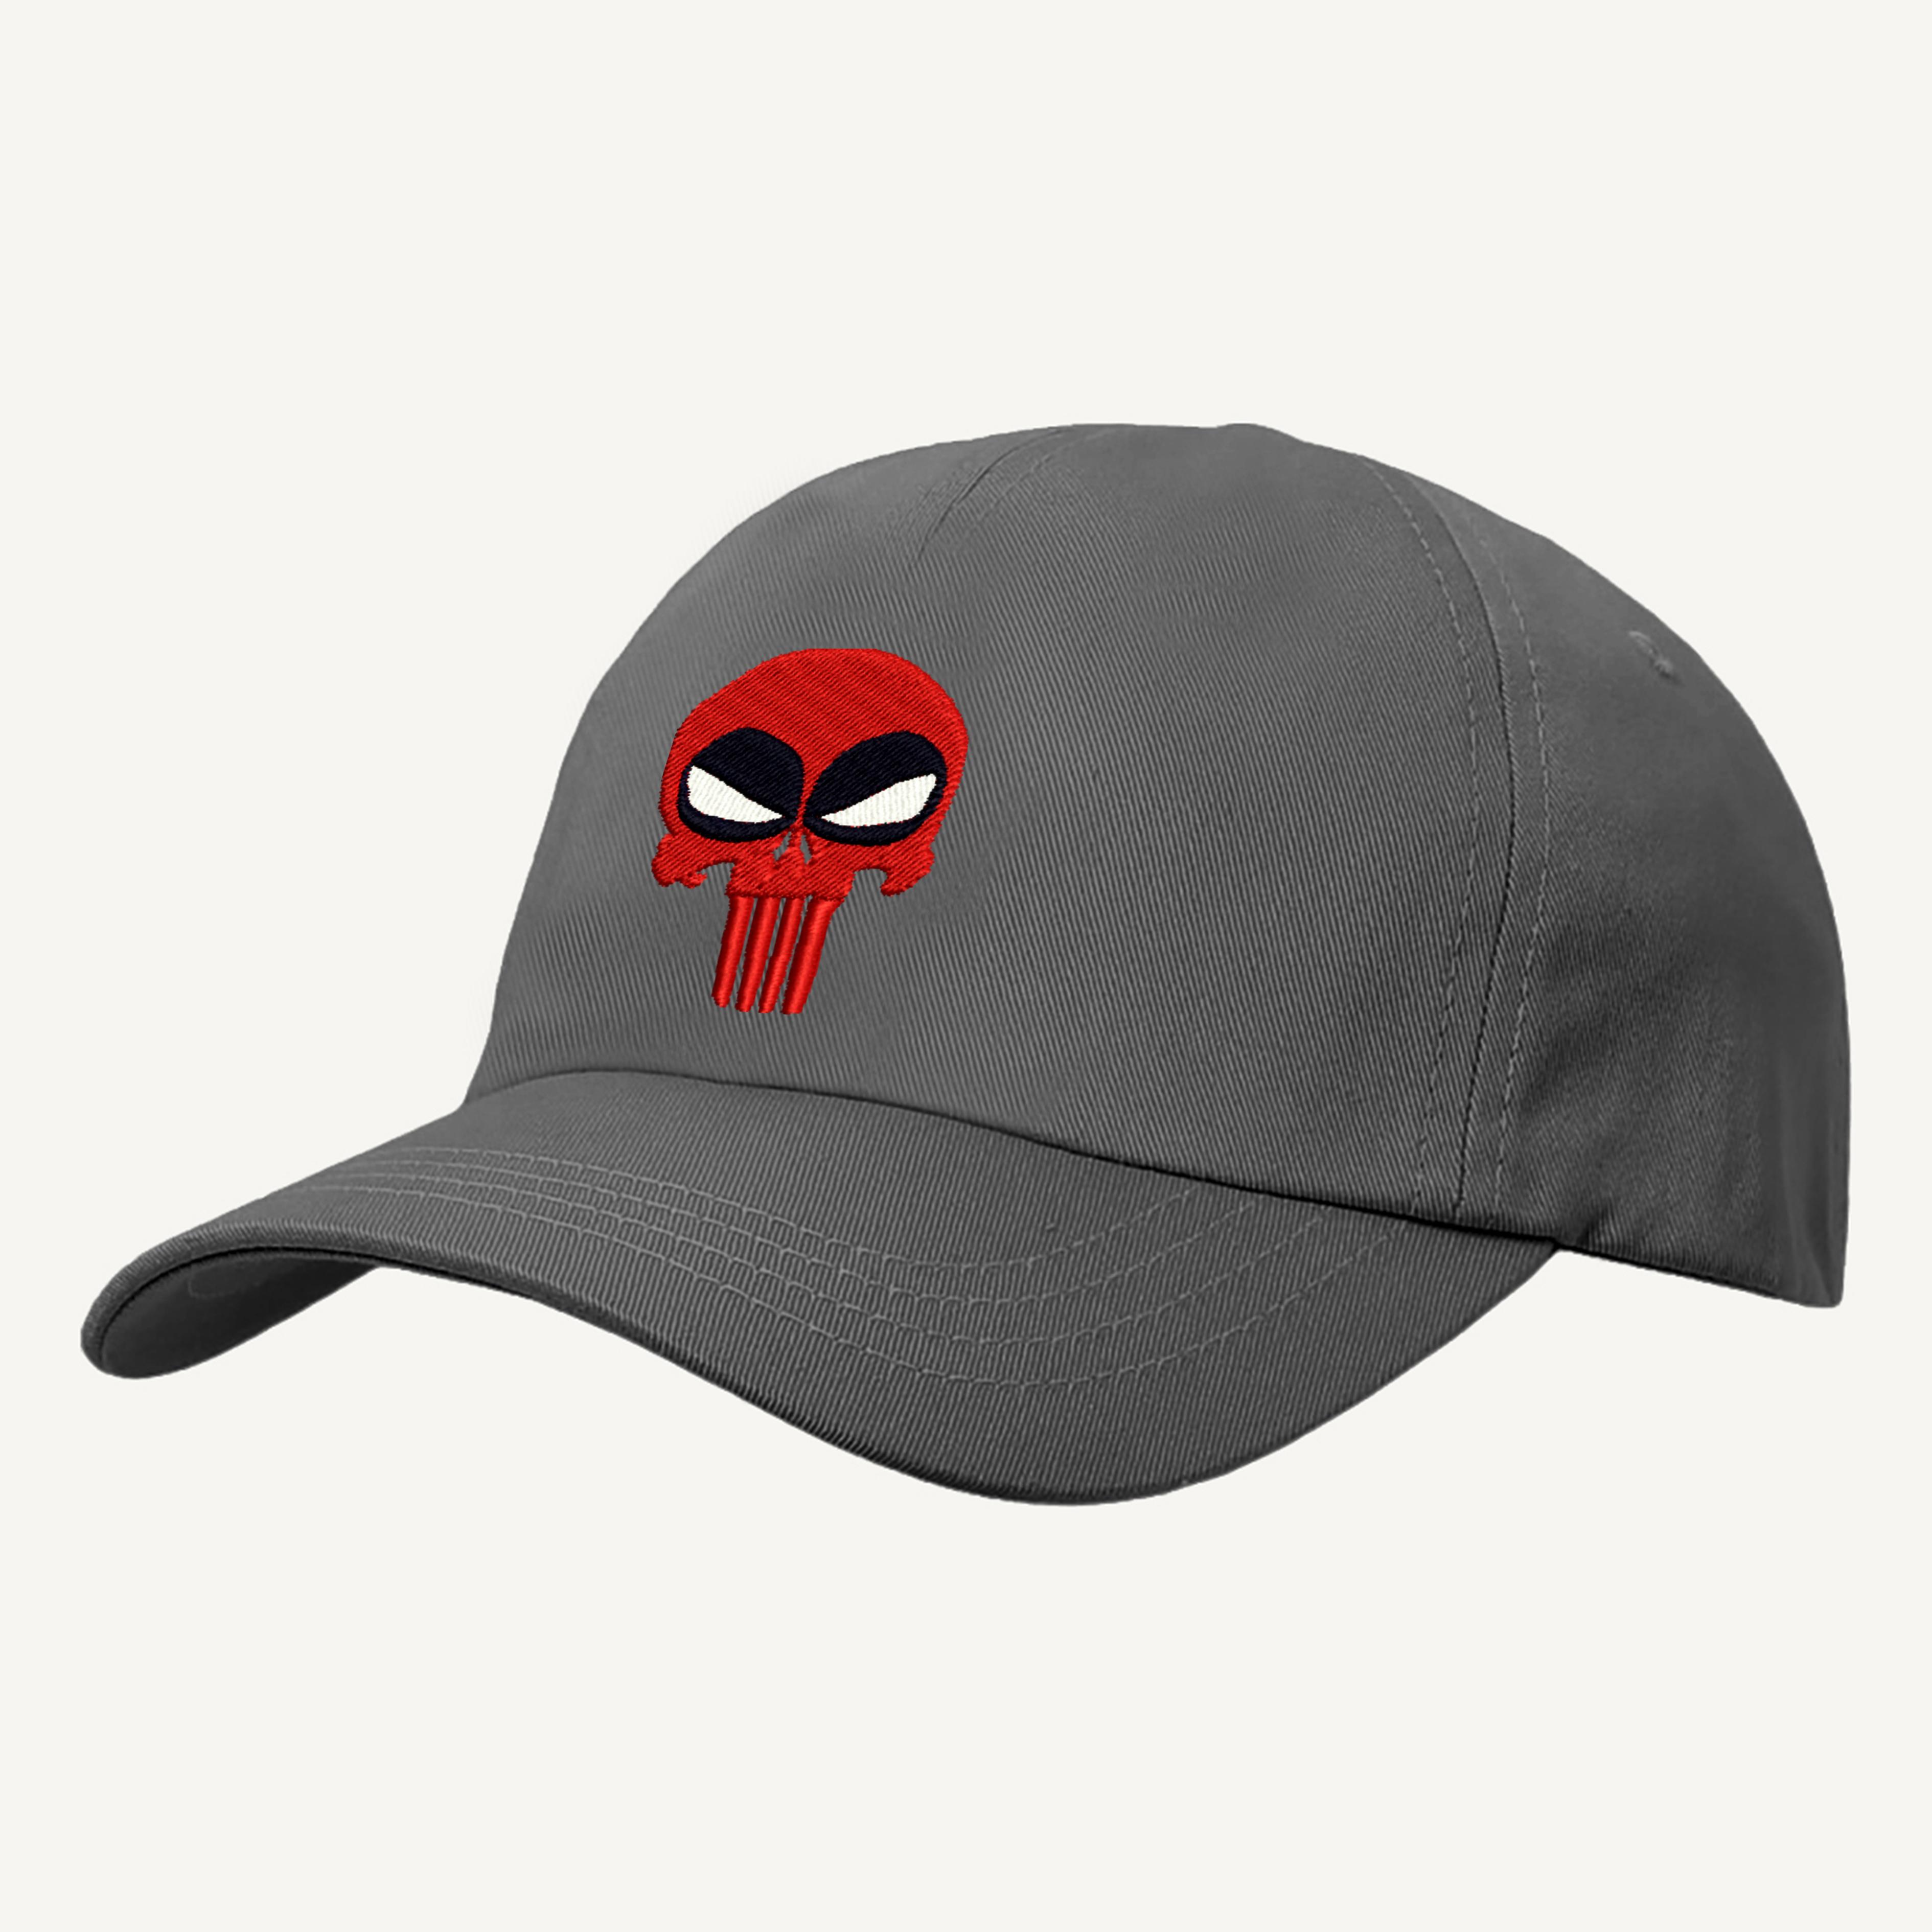 TIM Miller Ricamato Design DEADPOOL Cappello da baseball DEADPOOL PUNITORE spoof Cappello